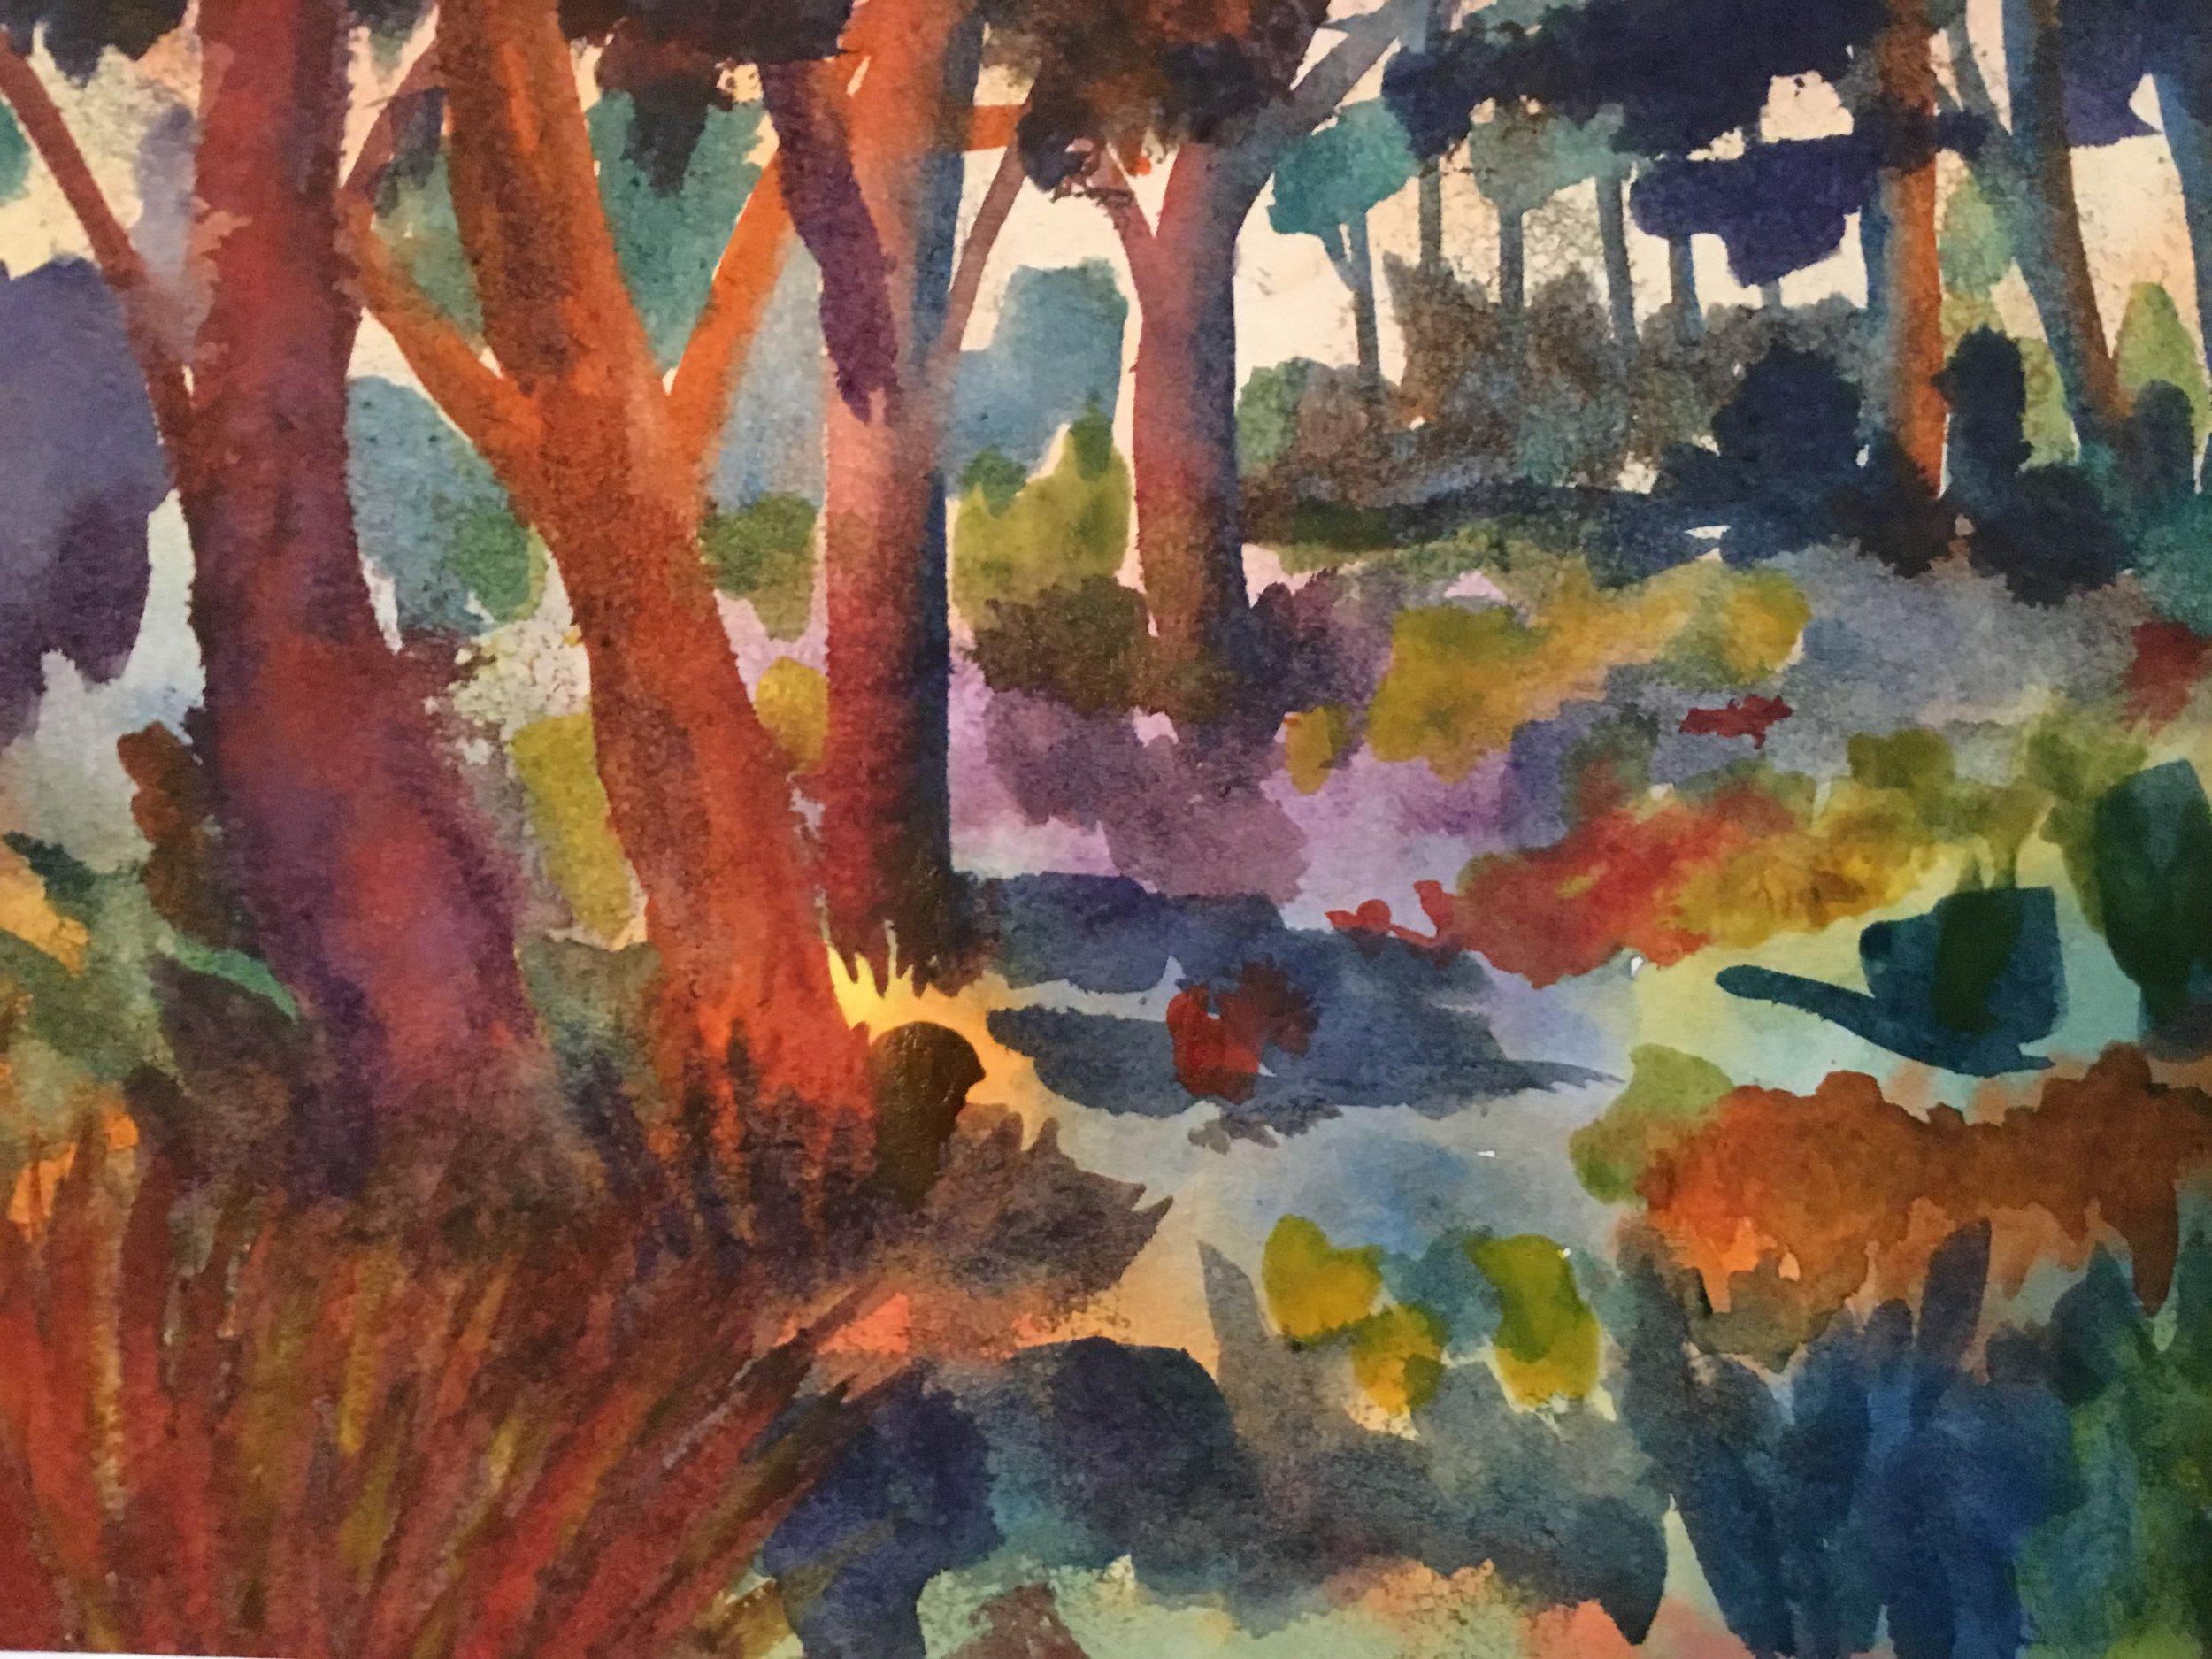 Patrick Murphy, Woods in Light